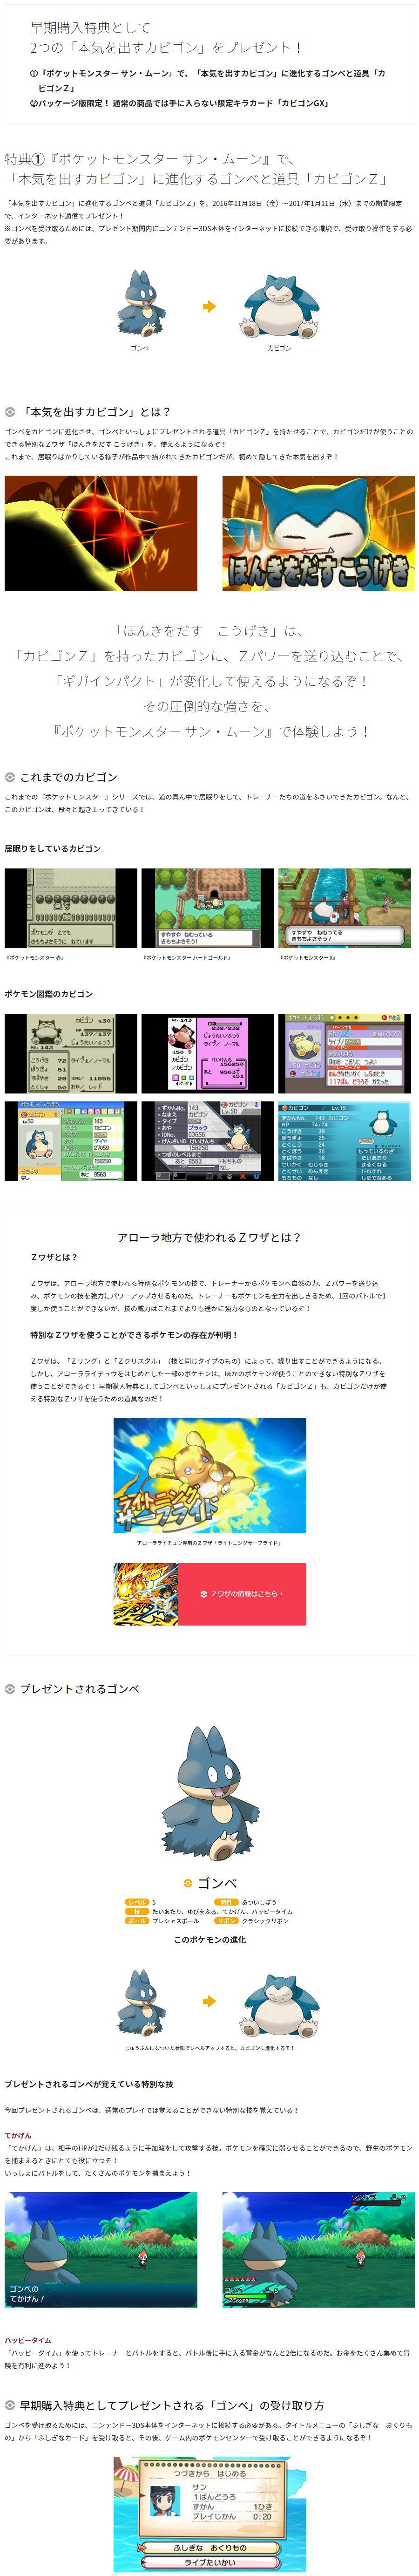 image_6312.jpg